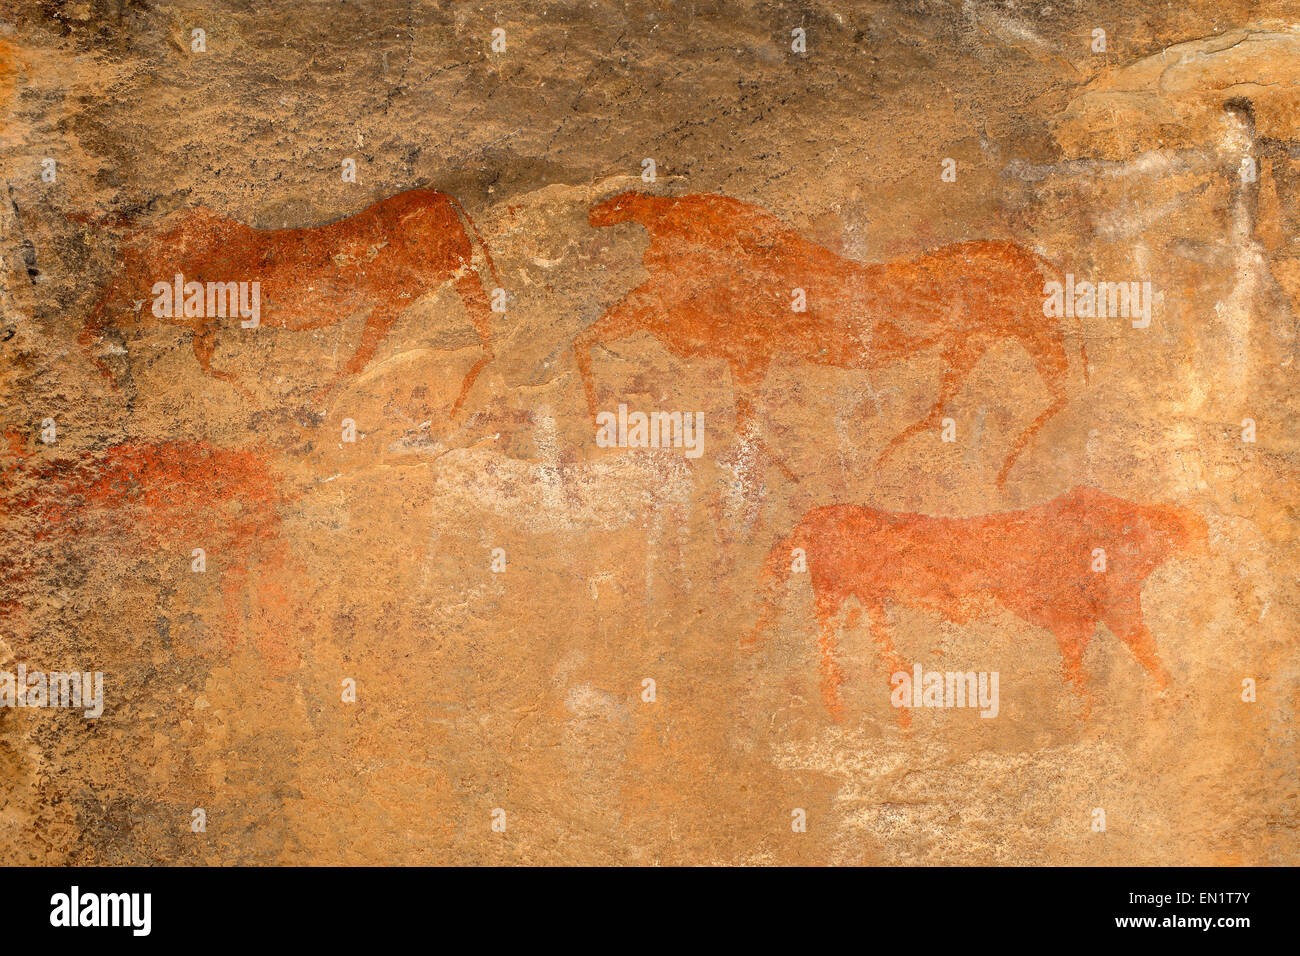 Bushmen (san) rock painting of antelopes, Karoo region, South Africa - Stock Image